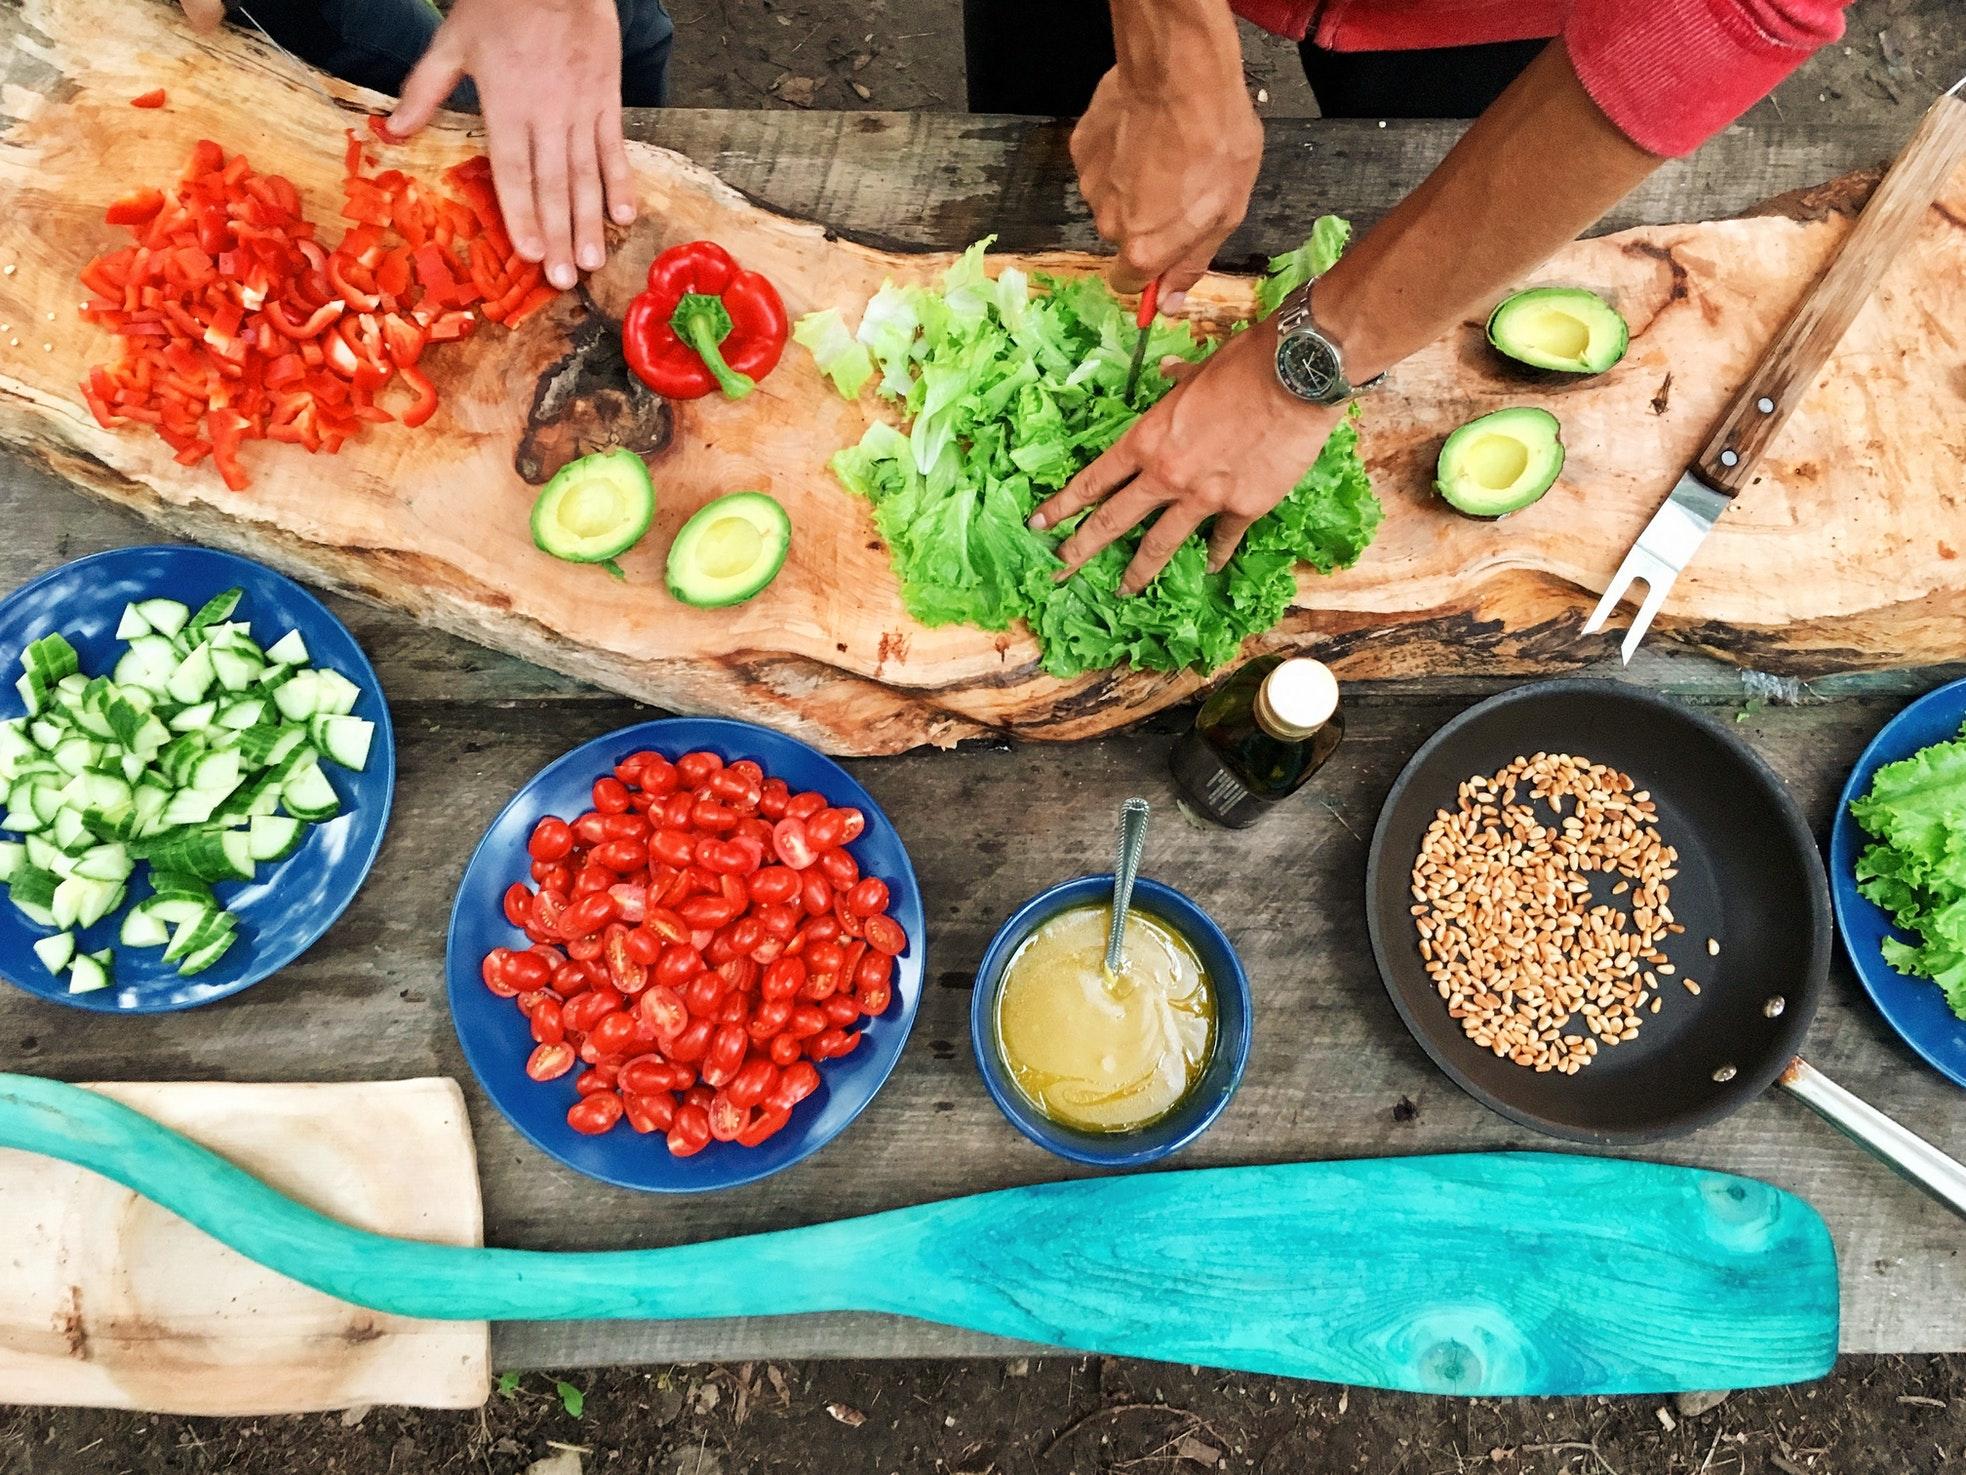 Tips that Make Meal Prep Easy